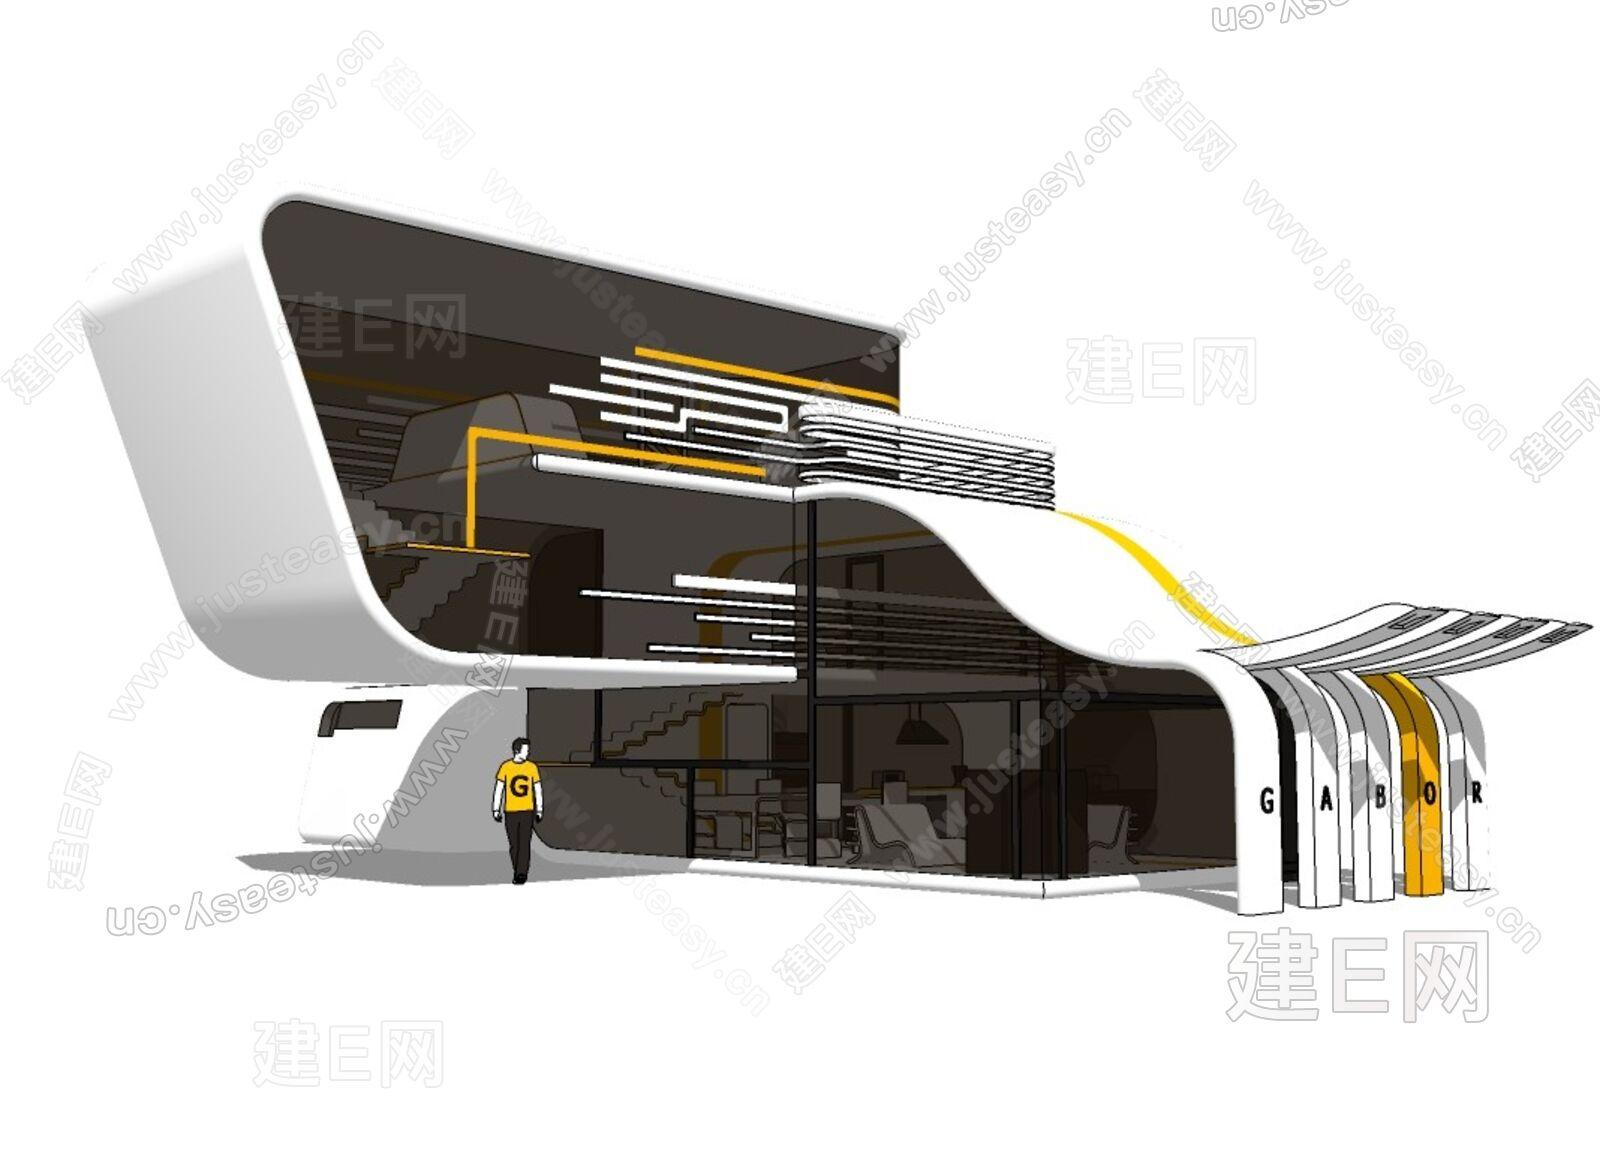 异性建筑sketchup模型